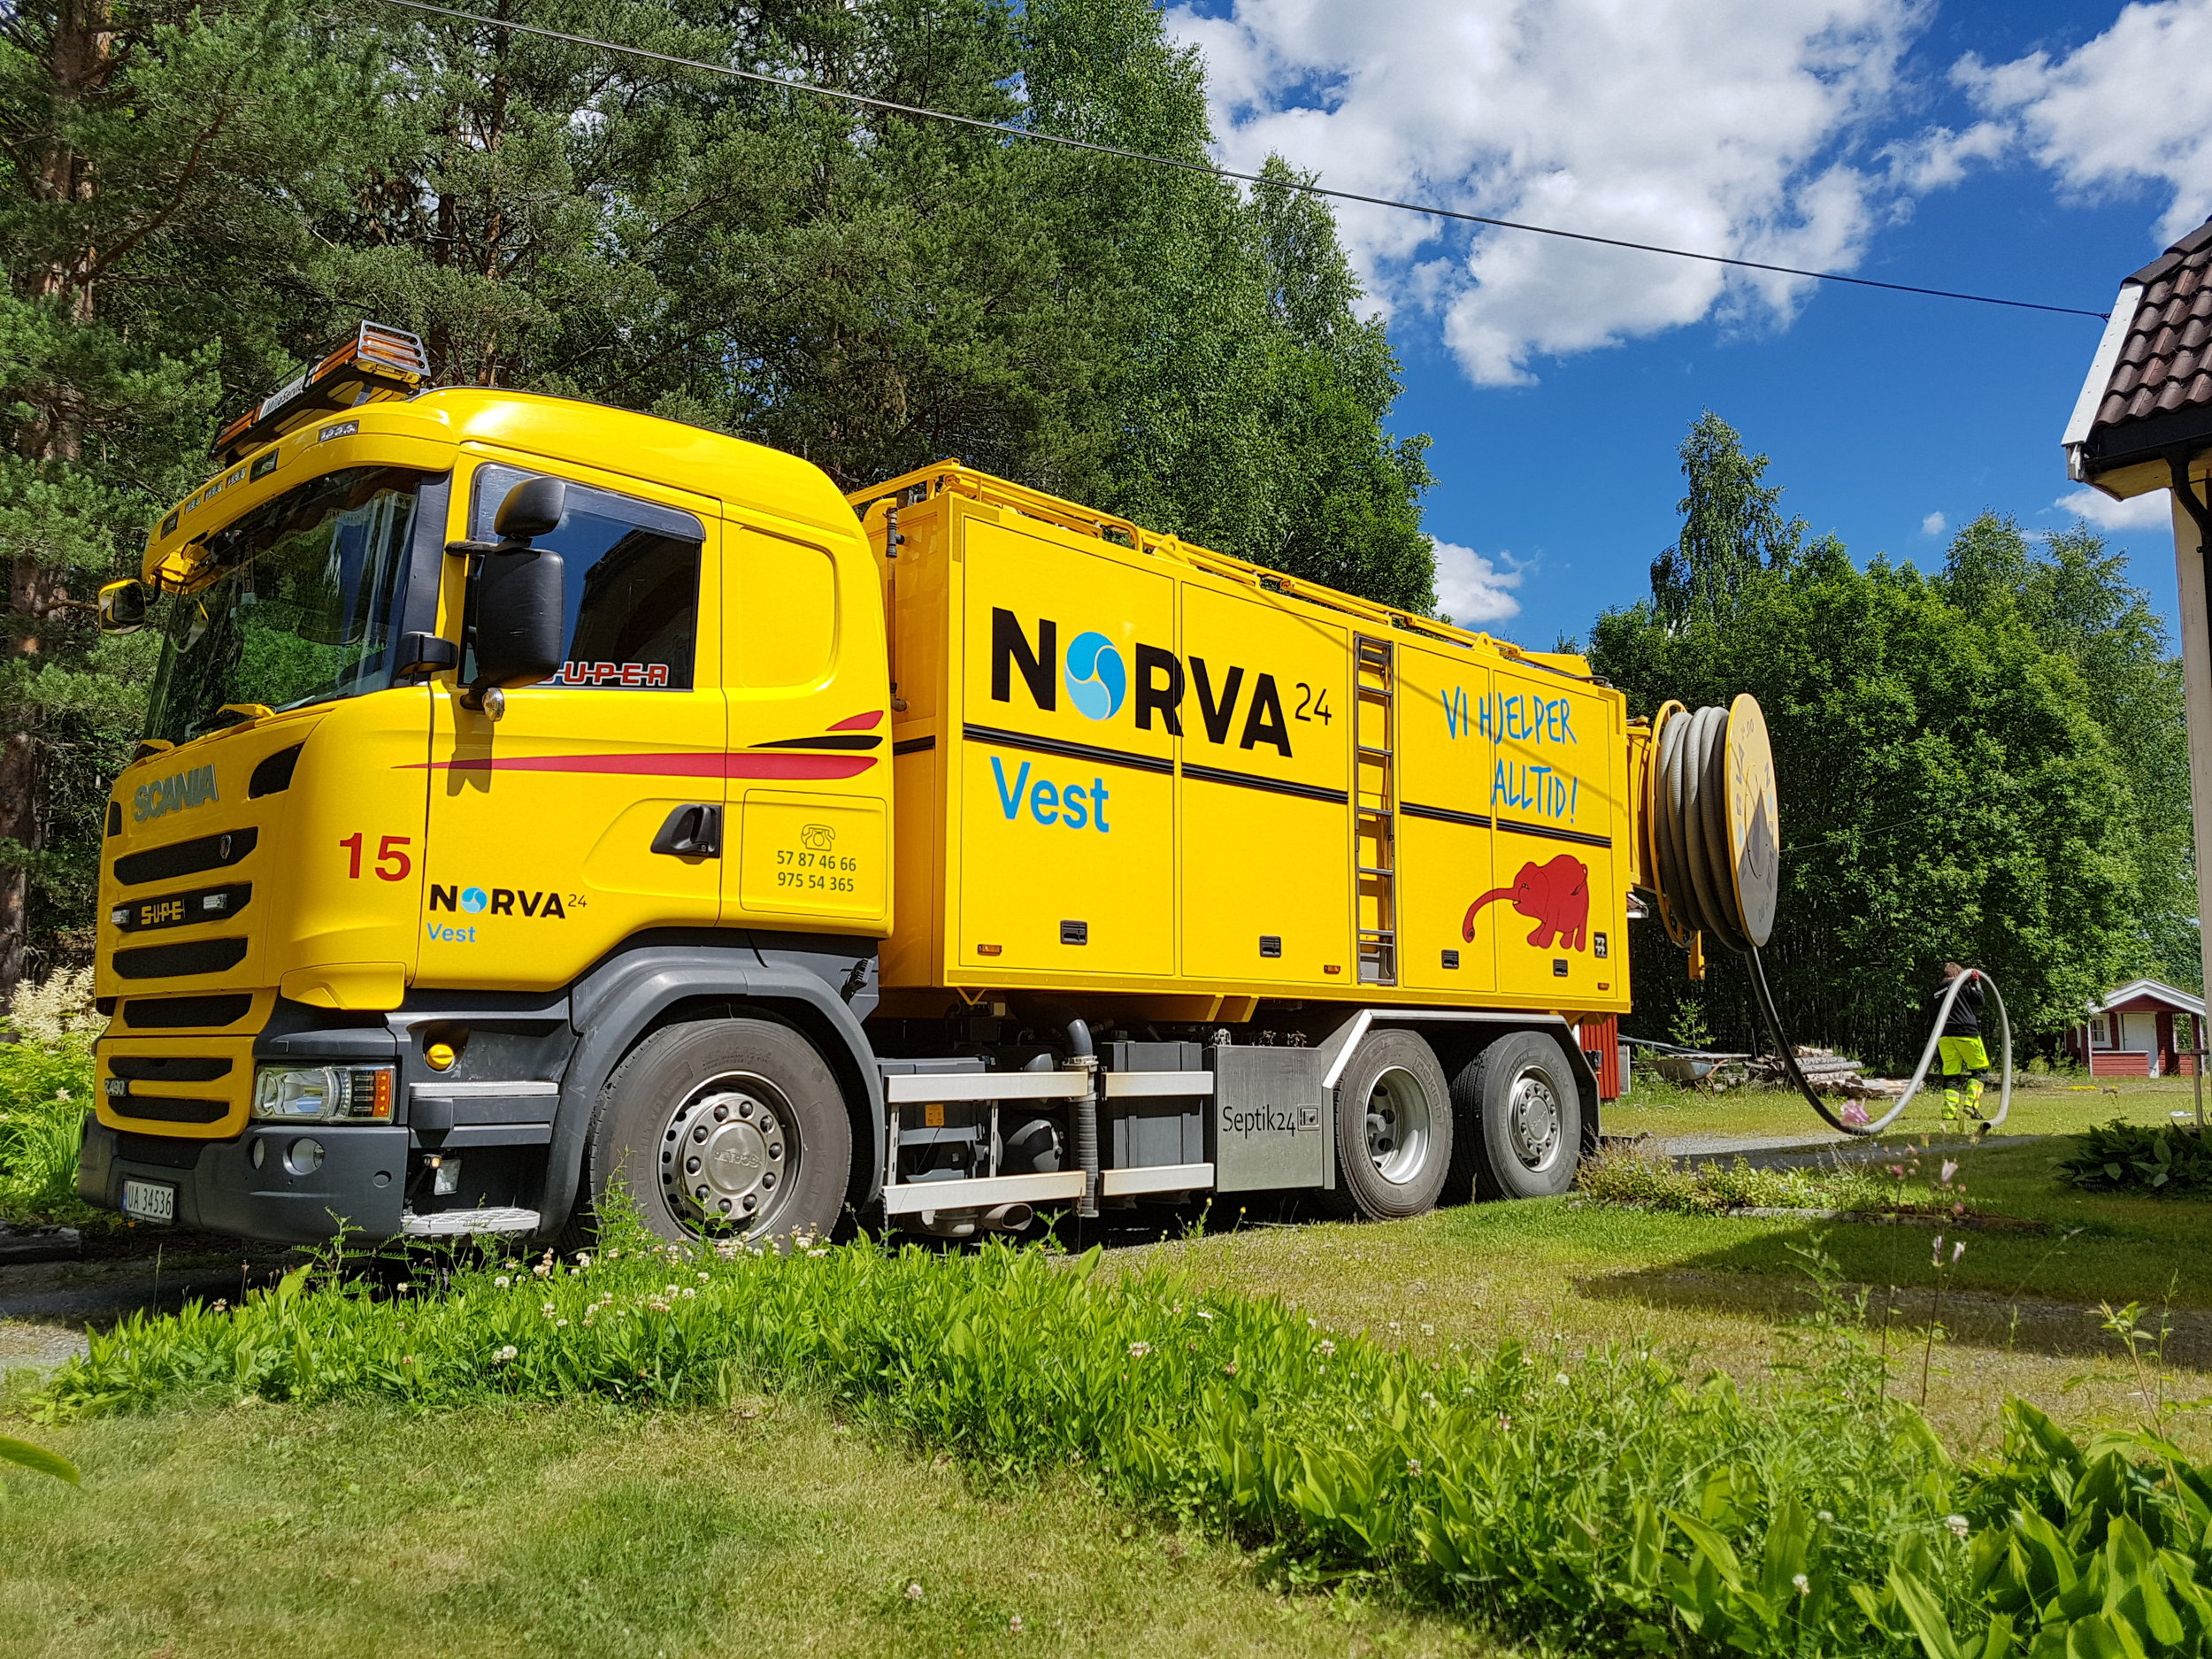 Foto: Norva24 Miljøservice